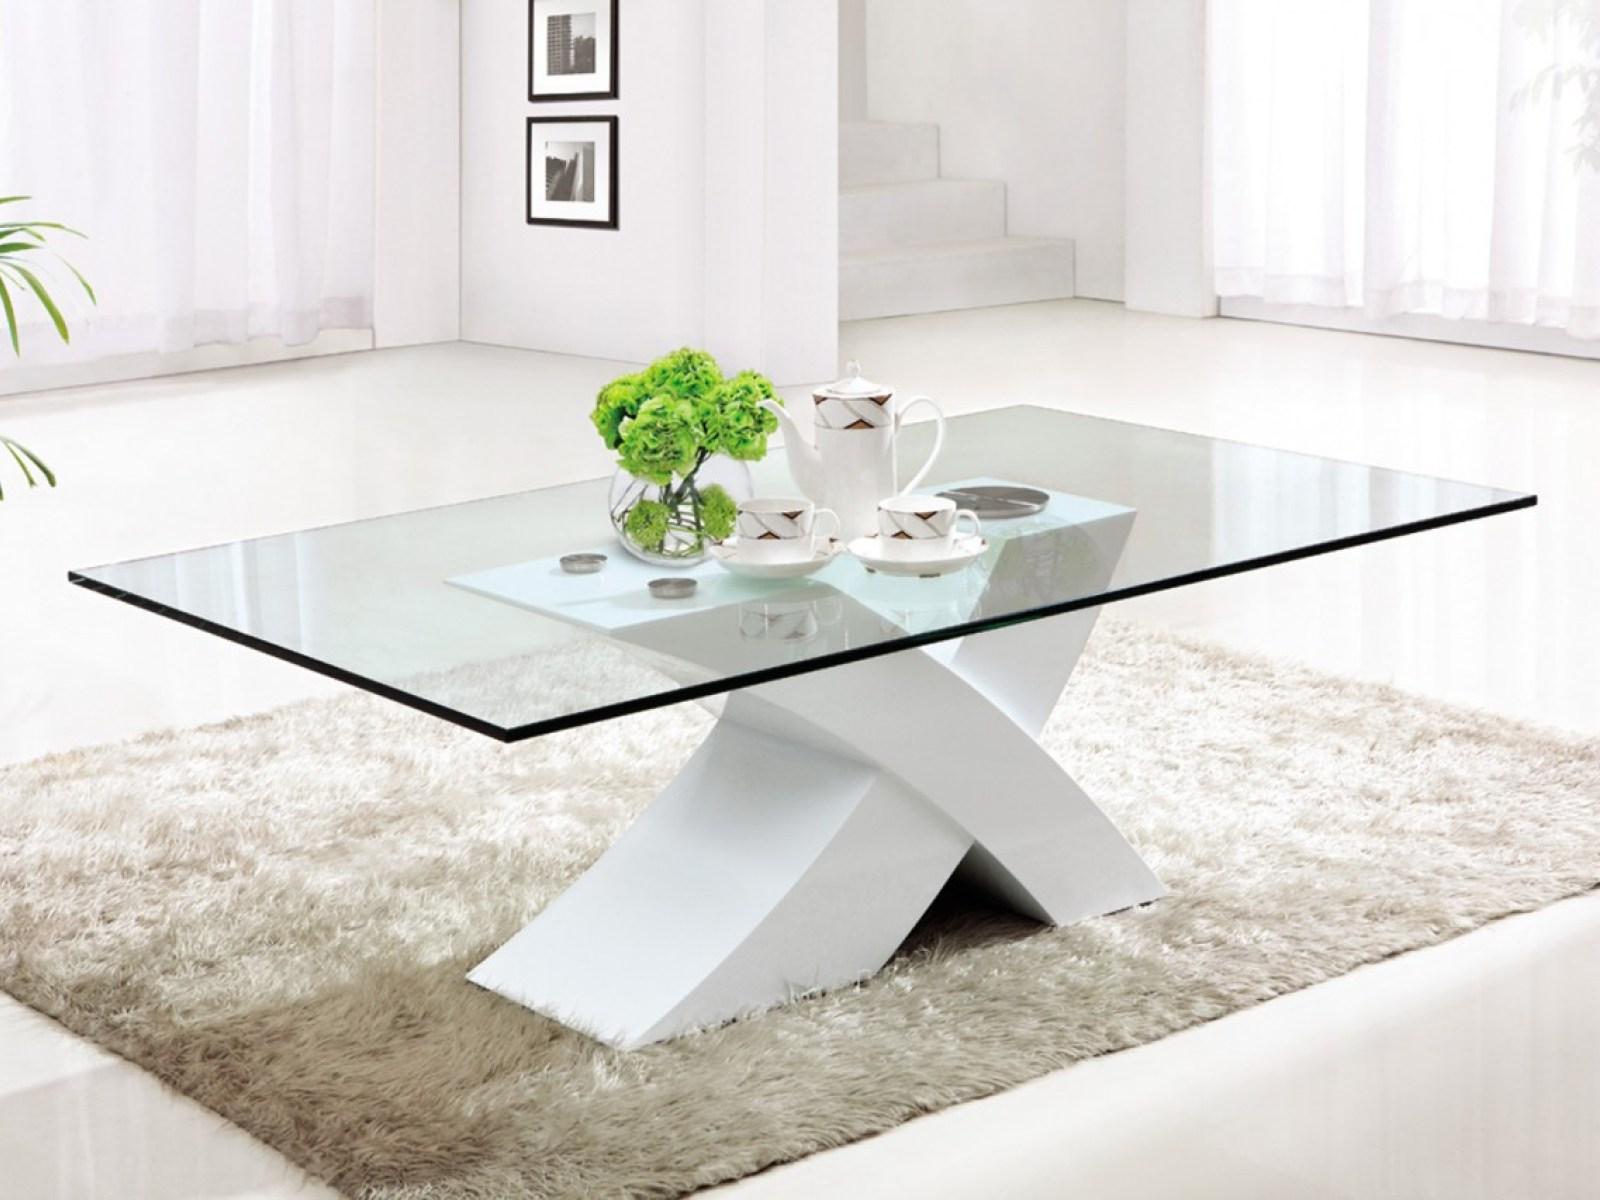 acrylic coffee table ikea 02